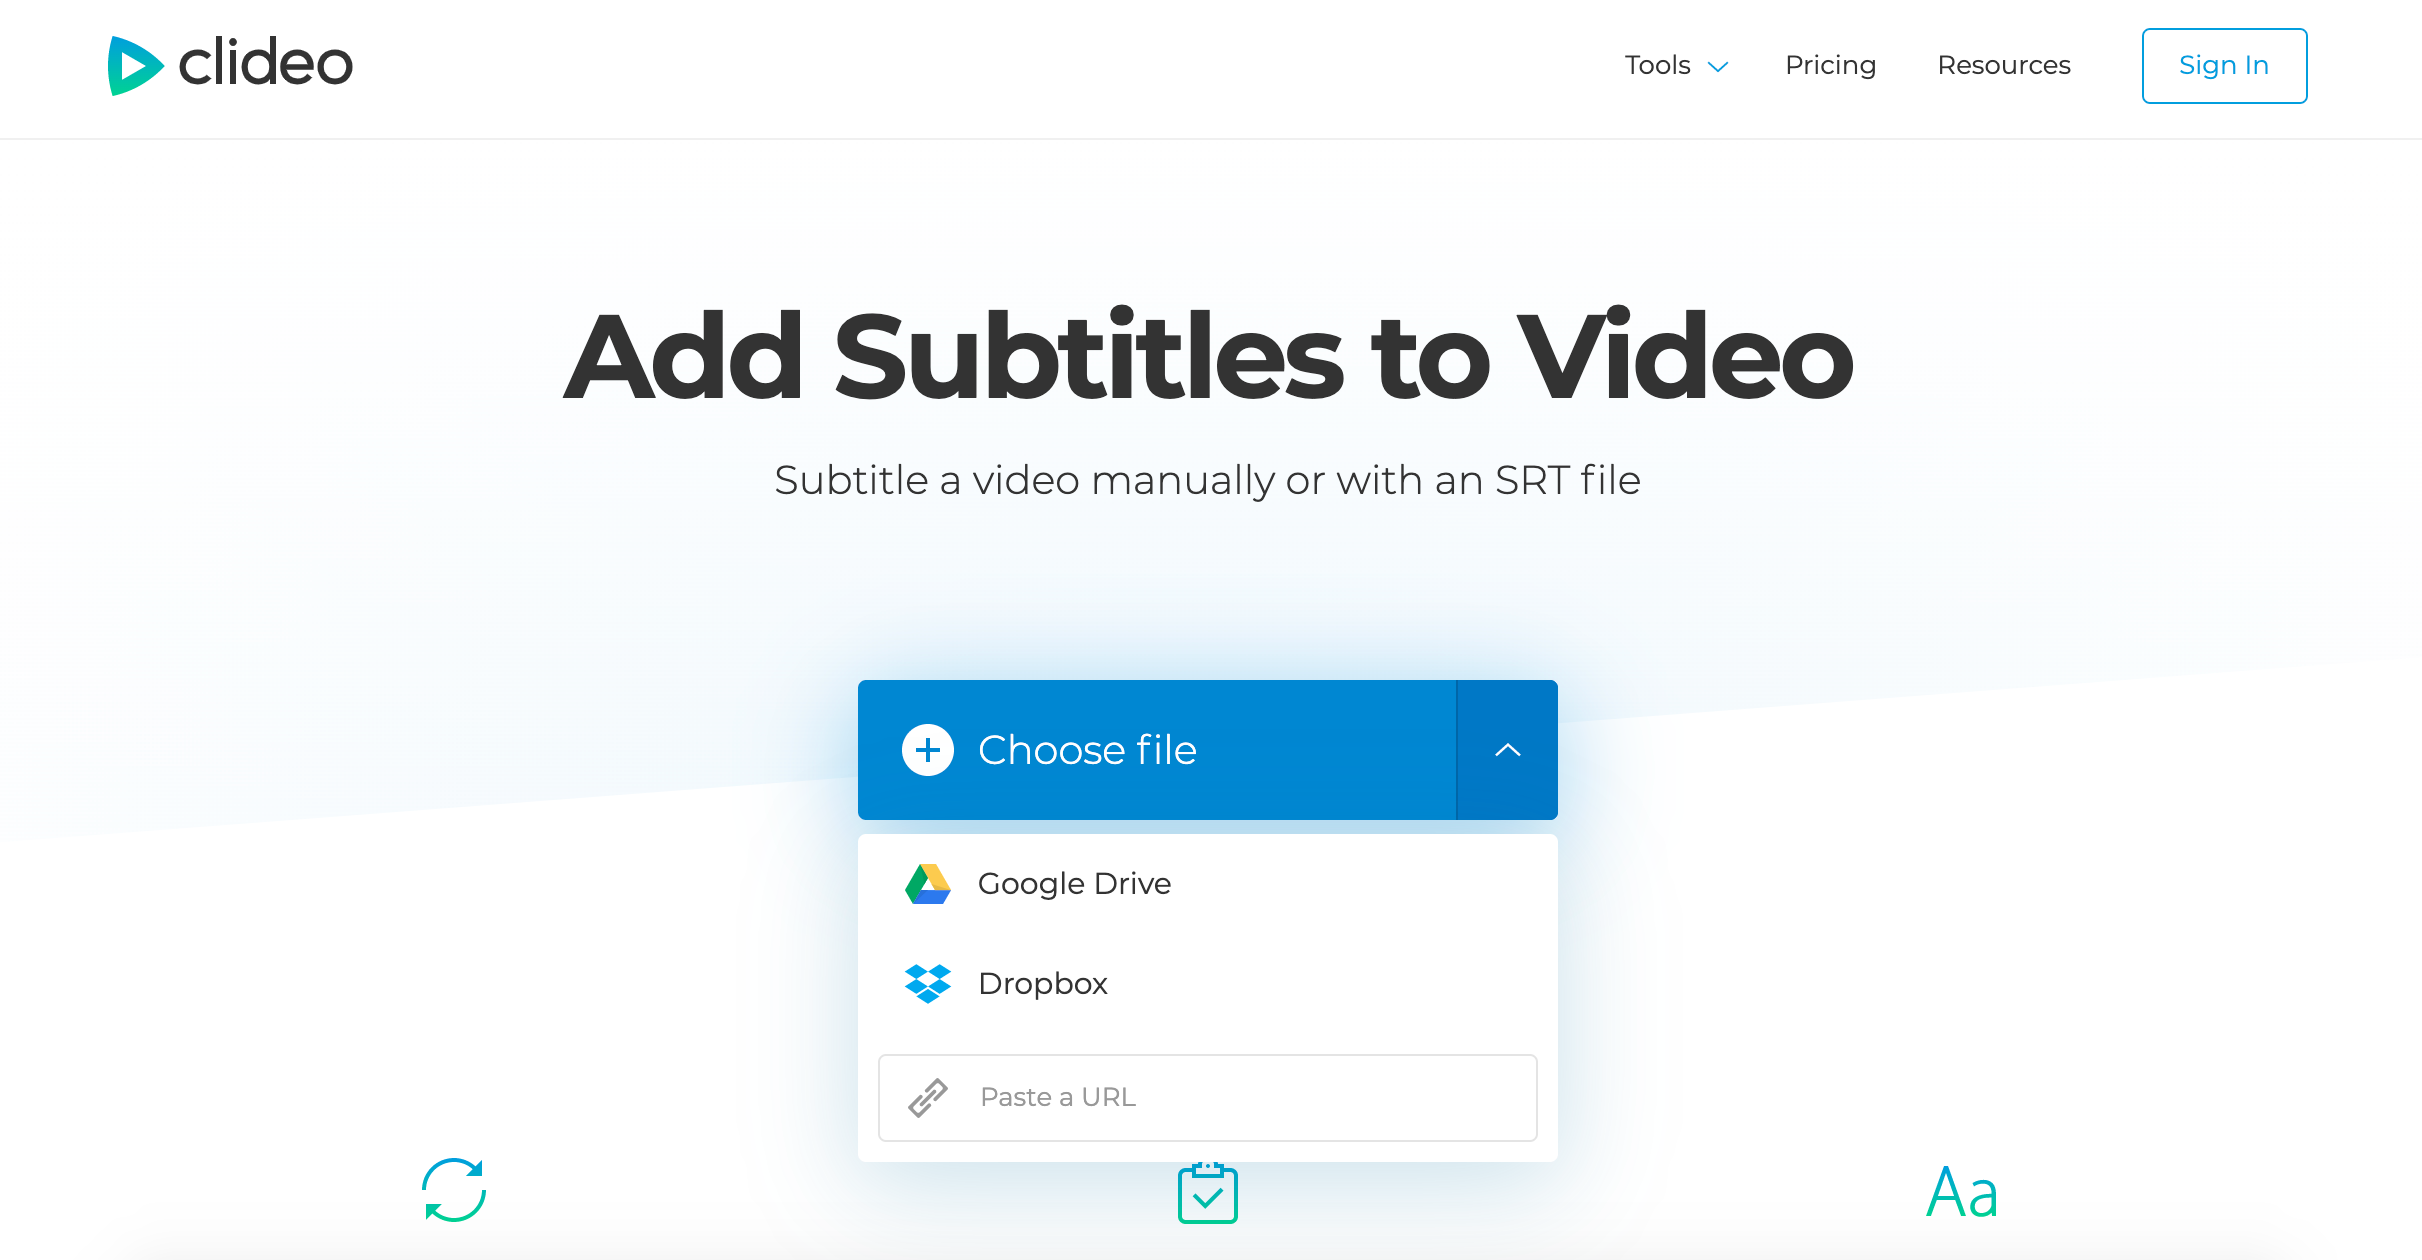 Upload a video for subtitles